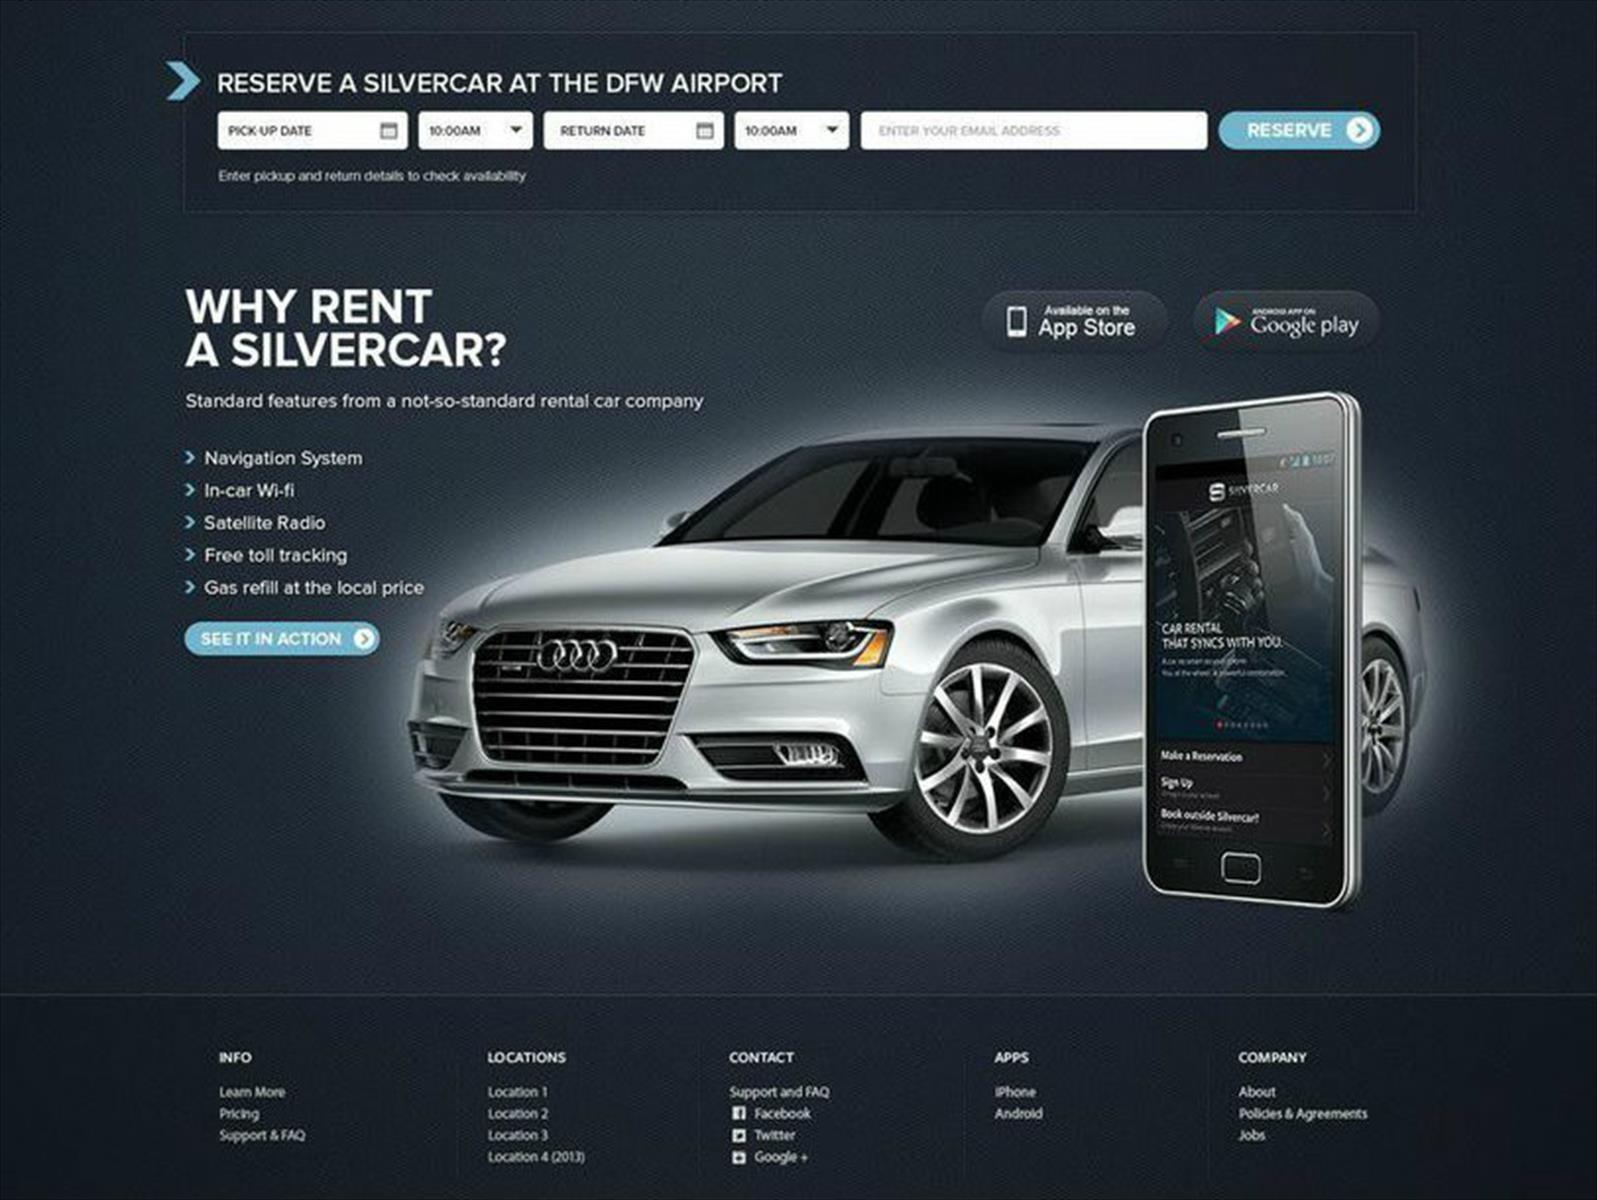 Audi compra la startup de renta de carros llamada Silvercar